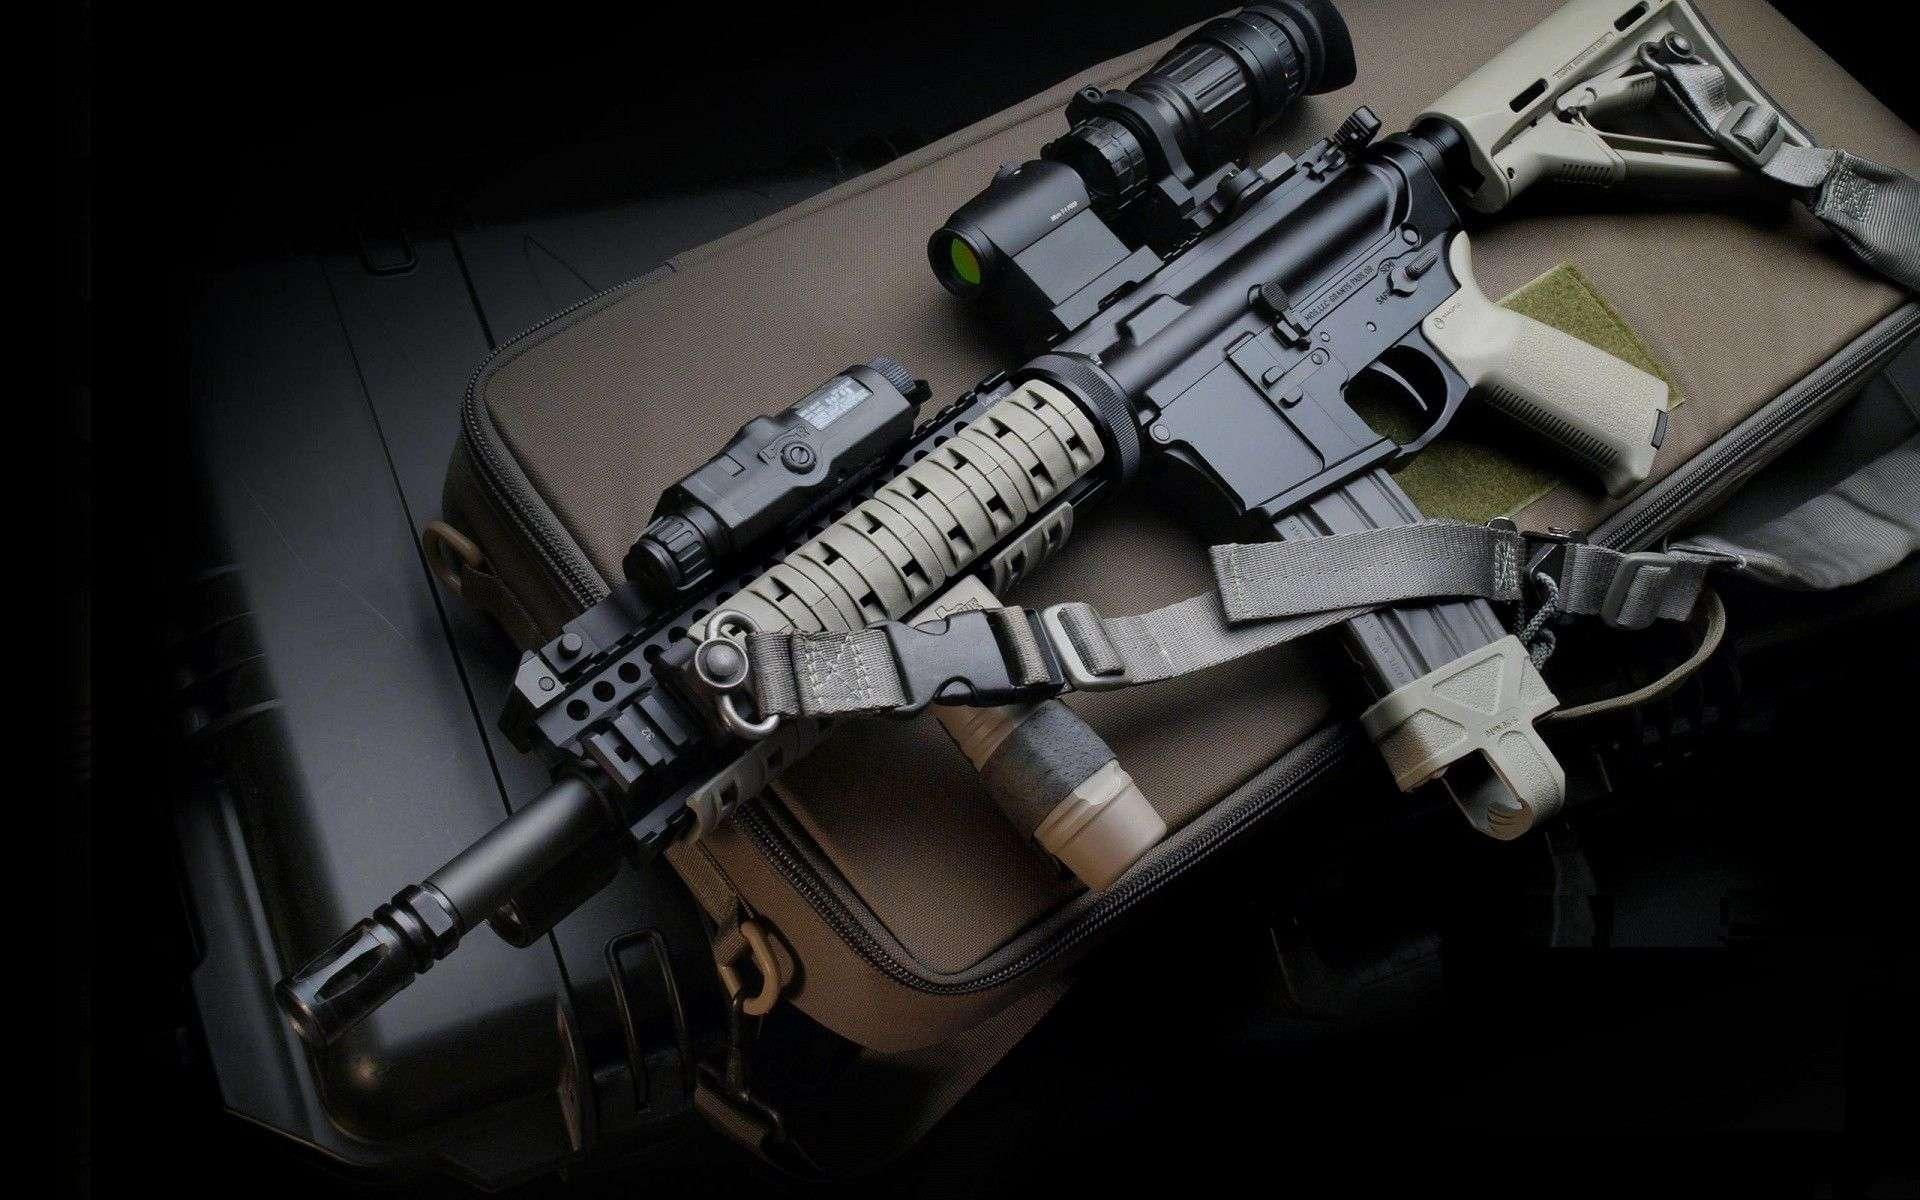 M4 Sniper Gun Wallpapers Hd Wallpapers 1920x1200